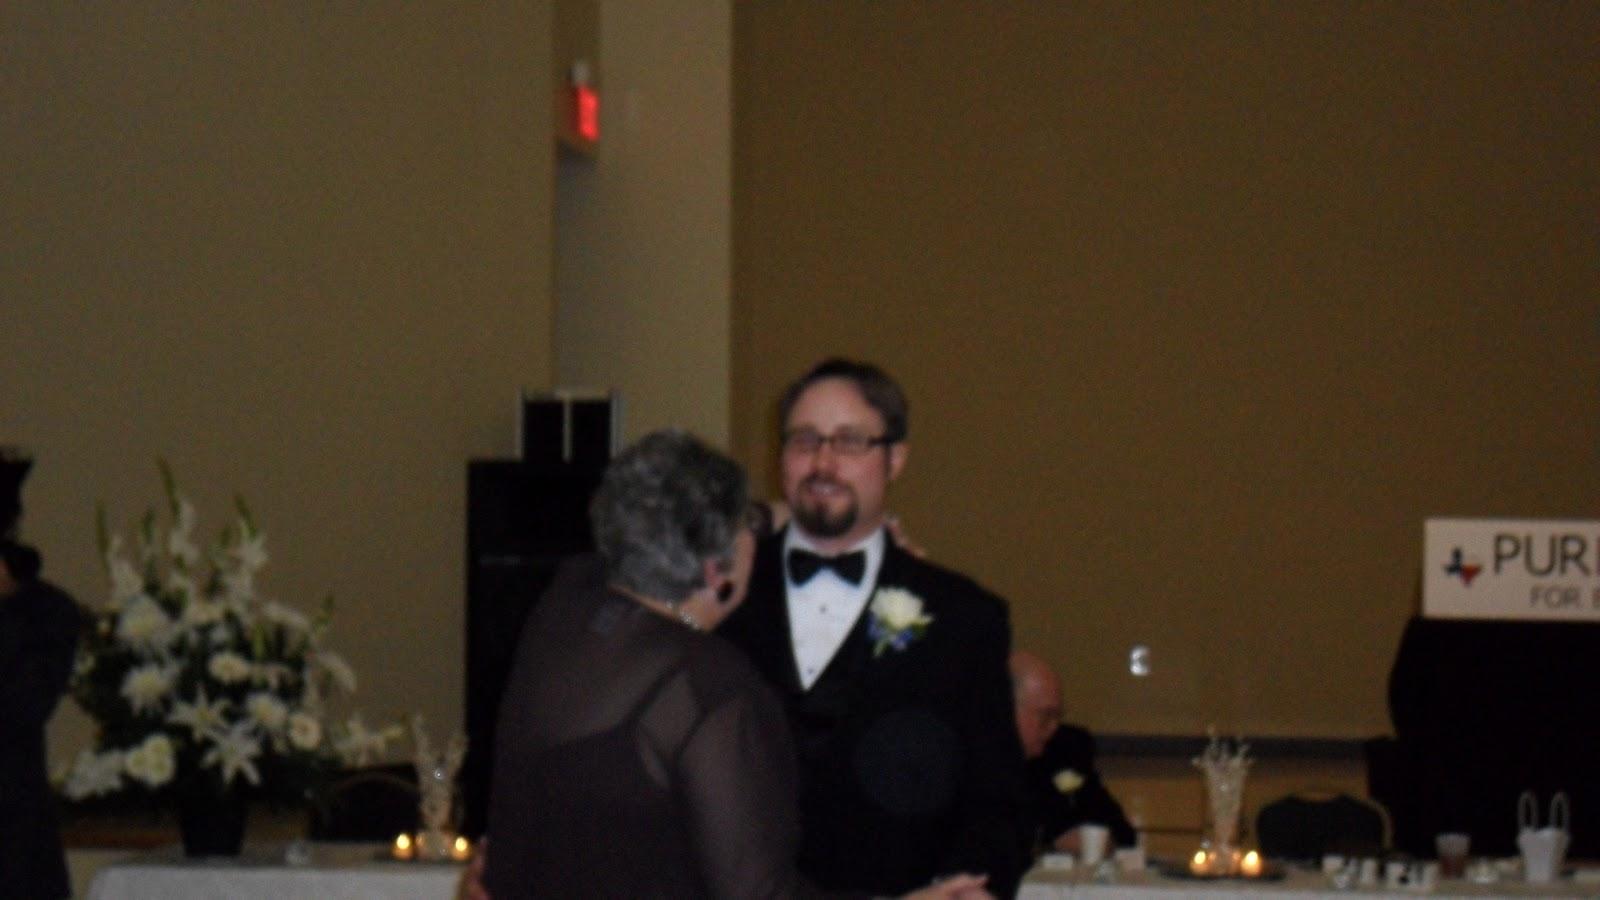 Our Wedding, photos by Rachel Perez - SAM_0193.JPG